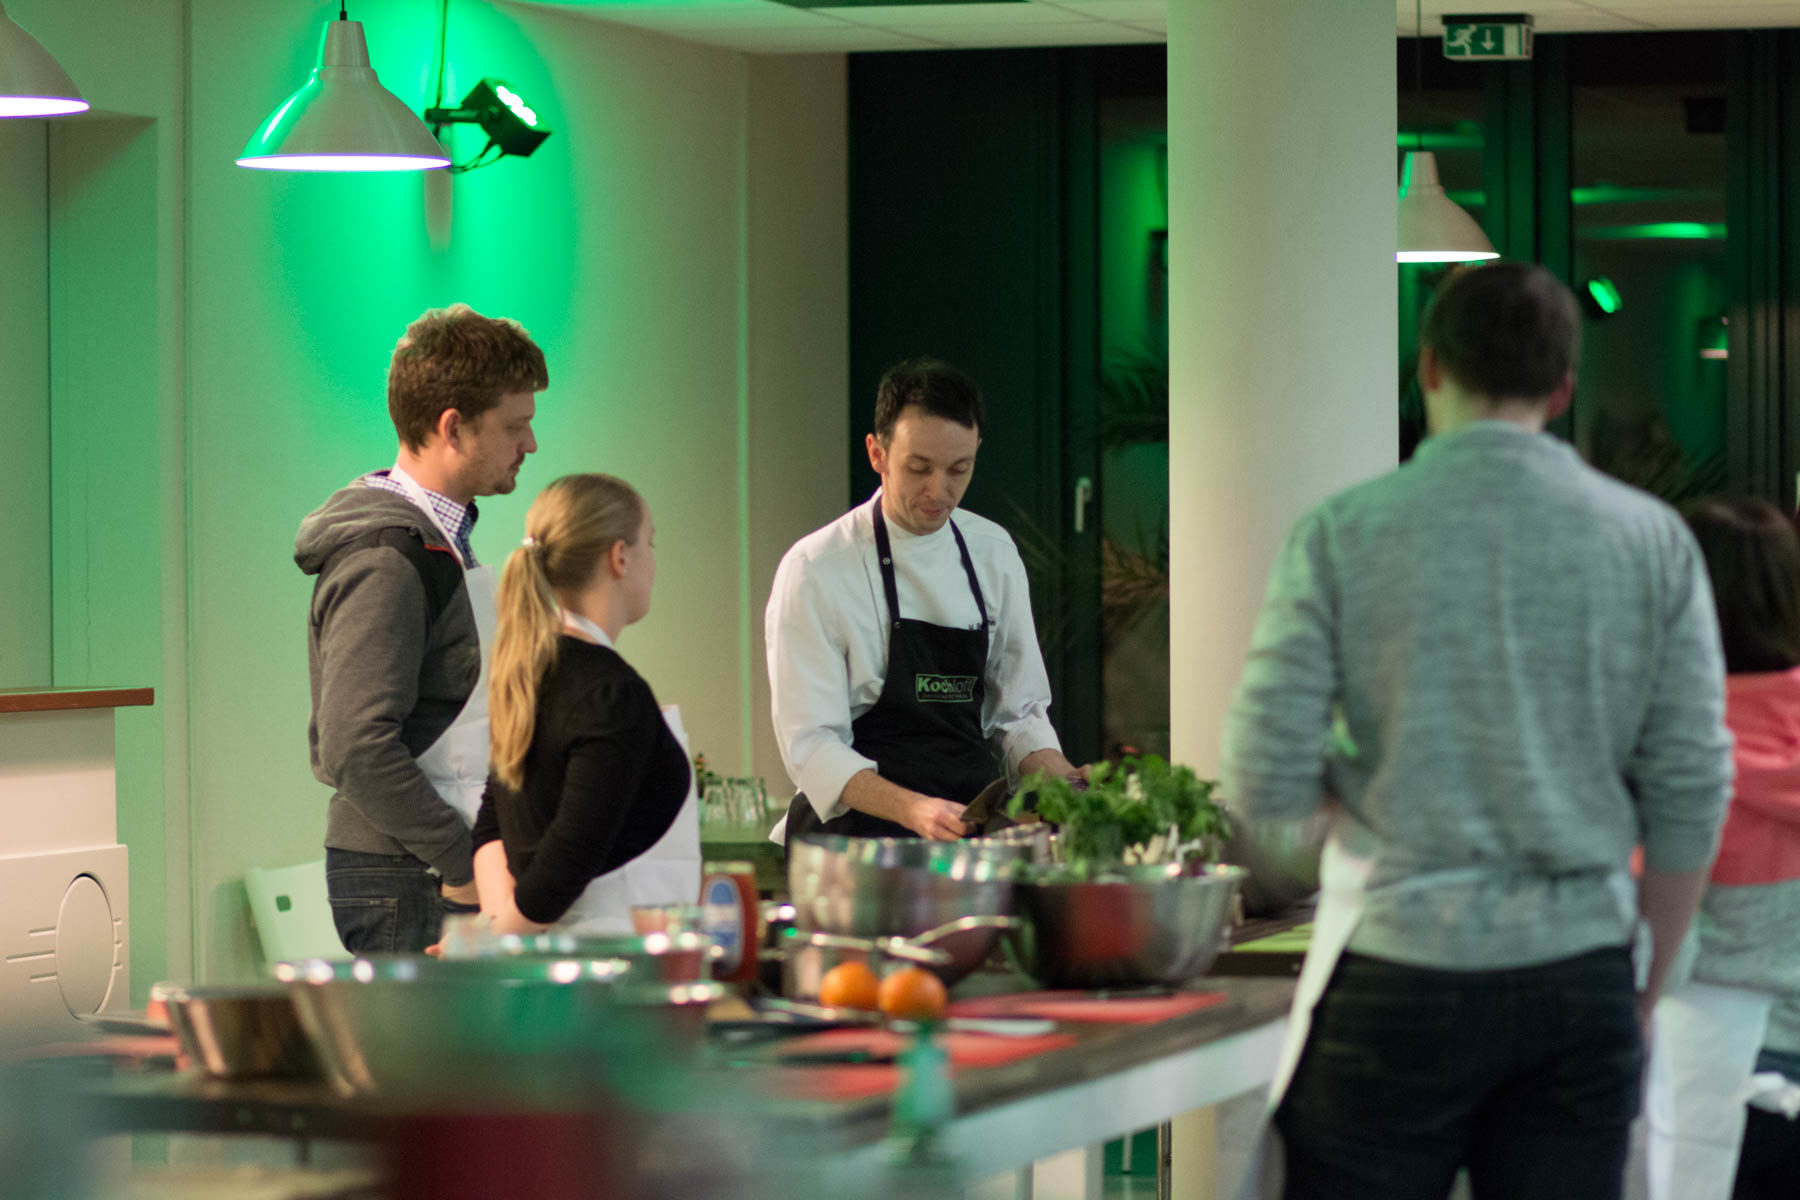 Ein Kochkurs als Teambuilding-Maßnahme